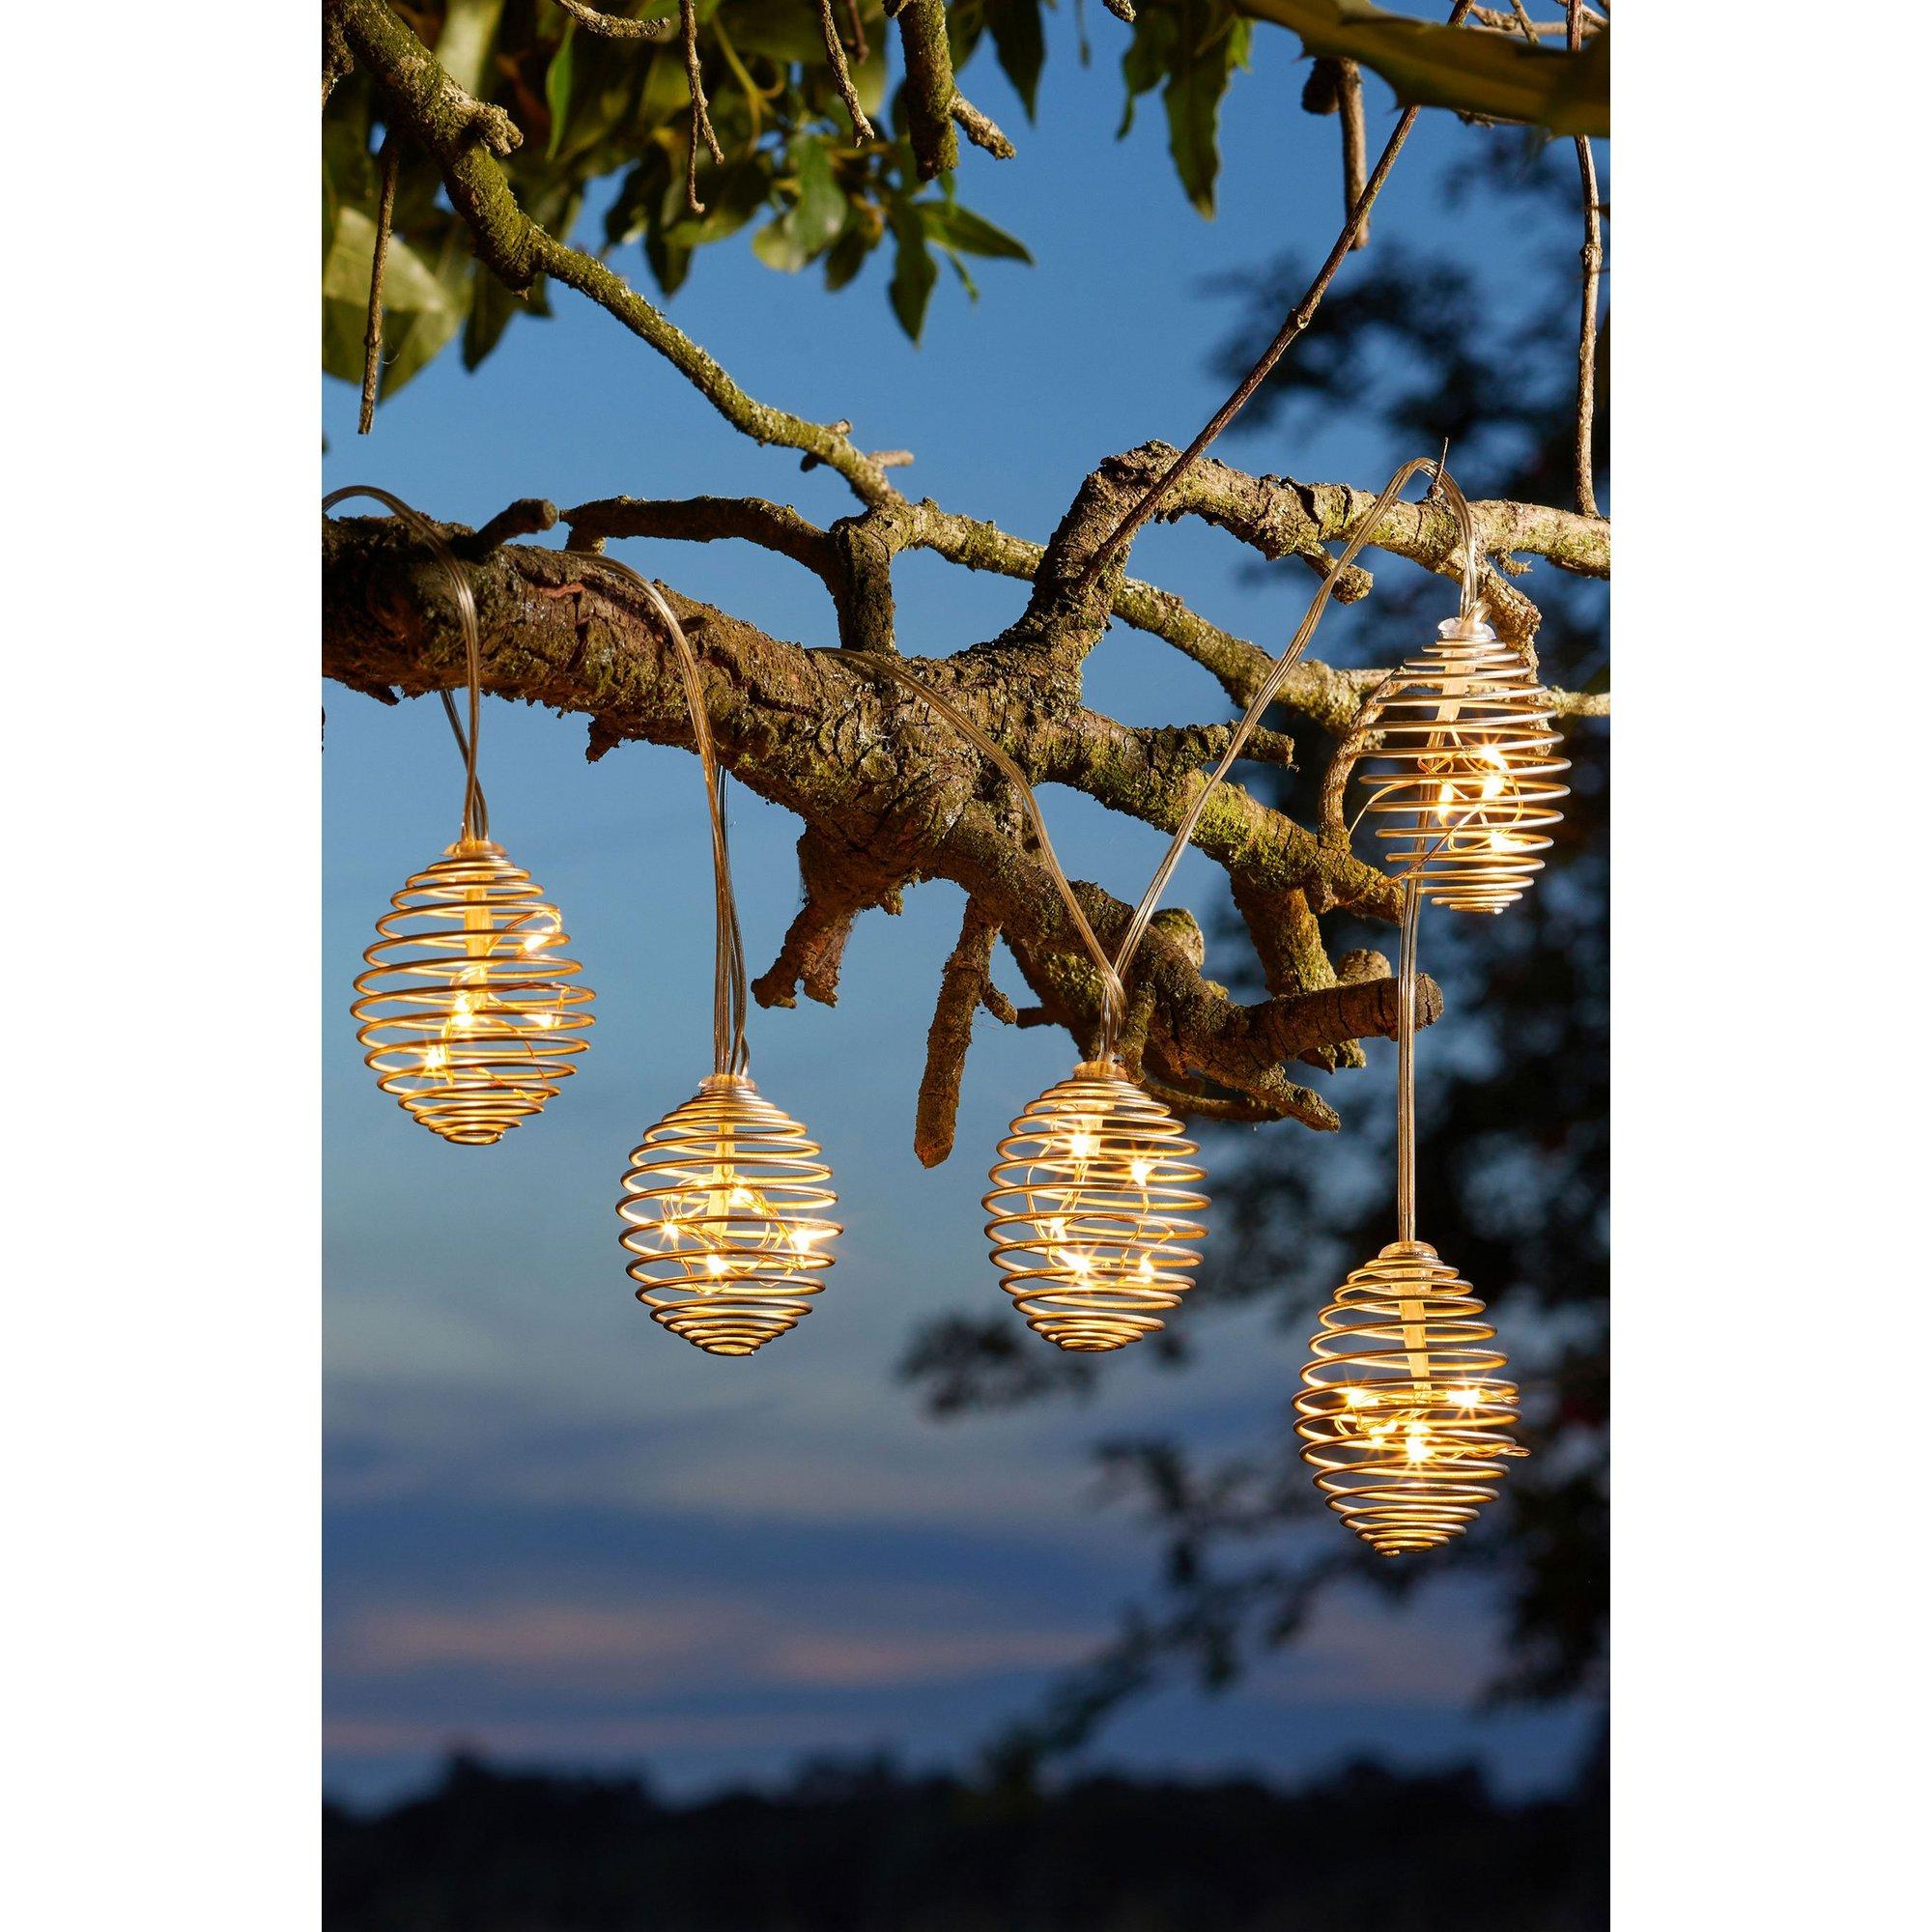 Image of 10 SpiraLight String Lights